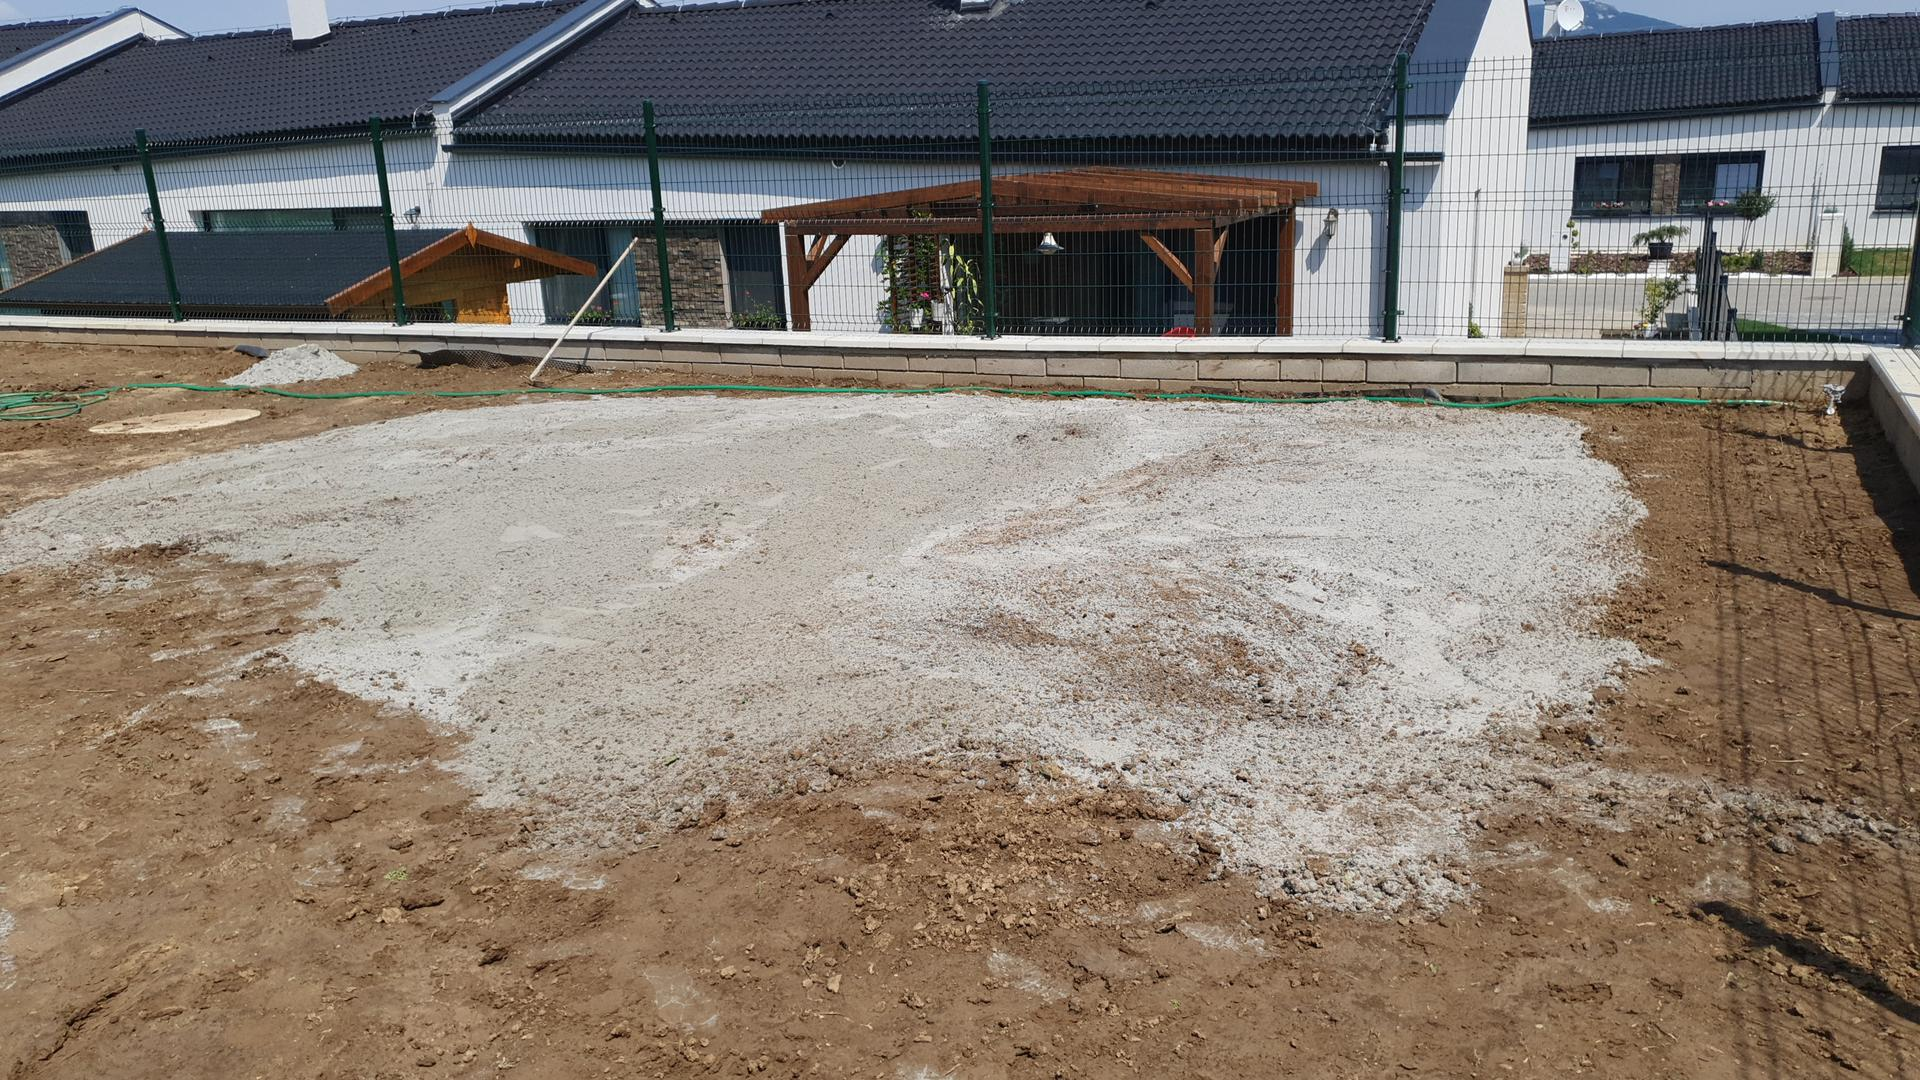 Travnik - Vyrovnavanie malych nerovnosti (okolo 5cm do hlbky) kremicitym pieskom 0-1 mm.